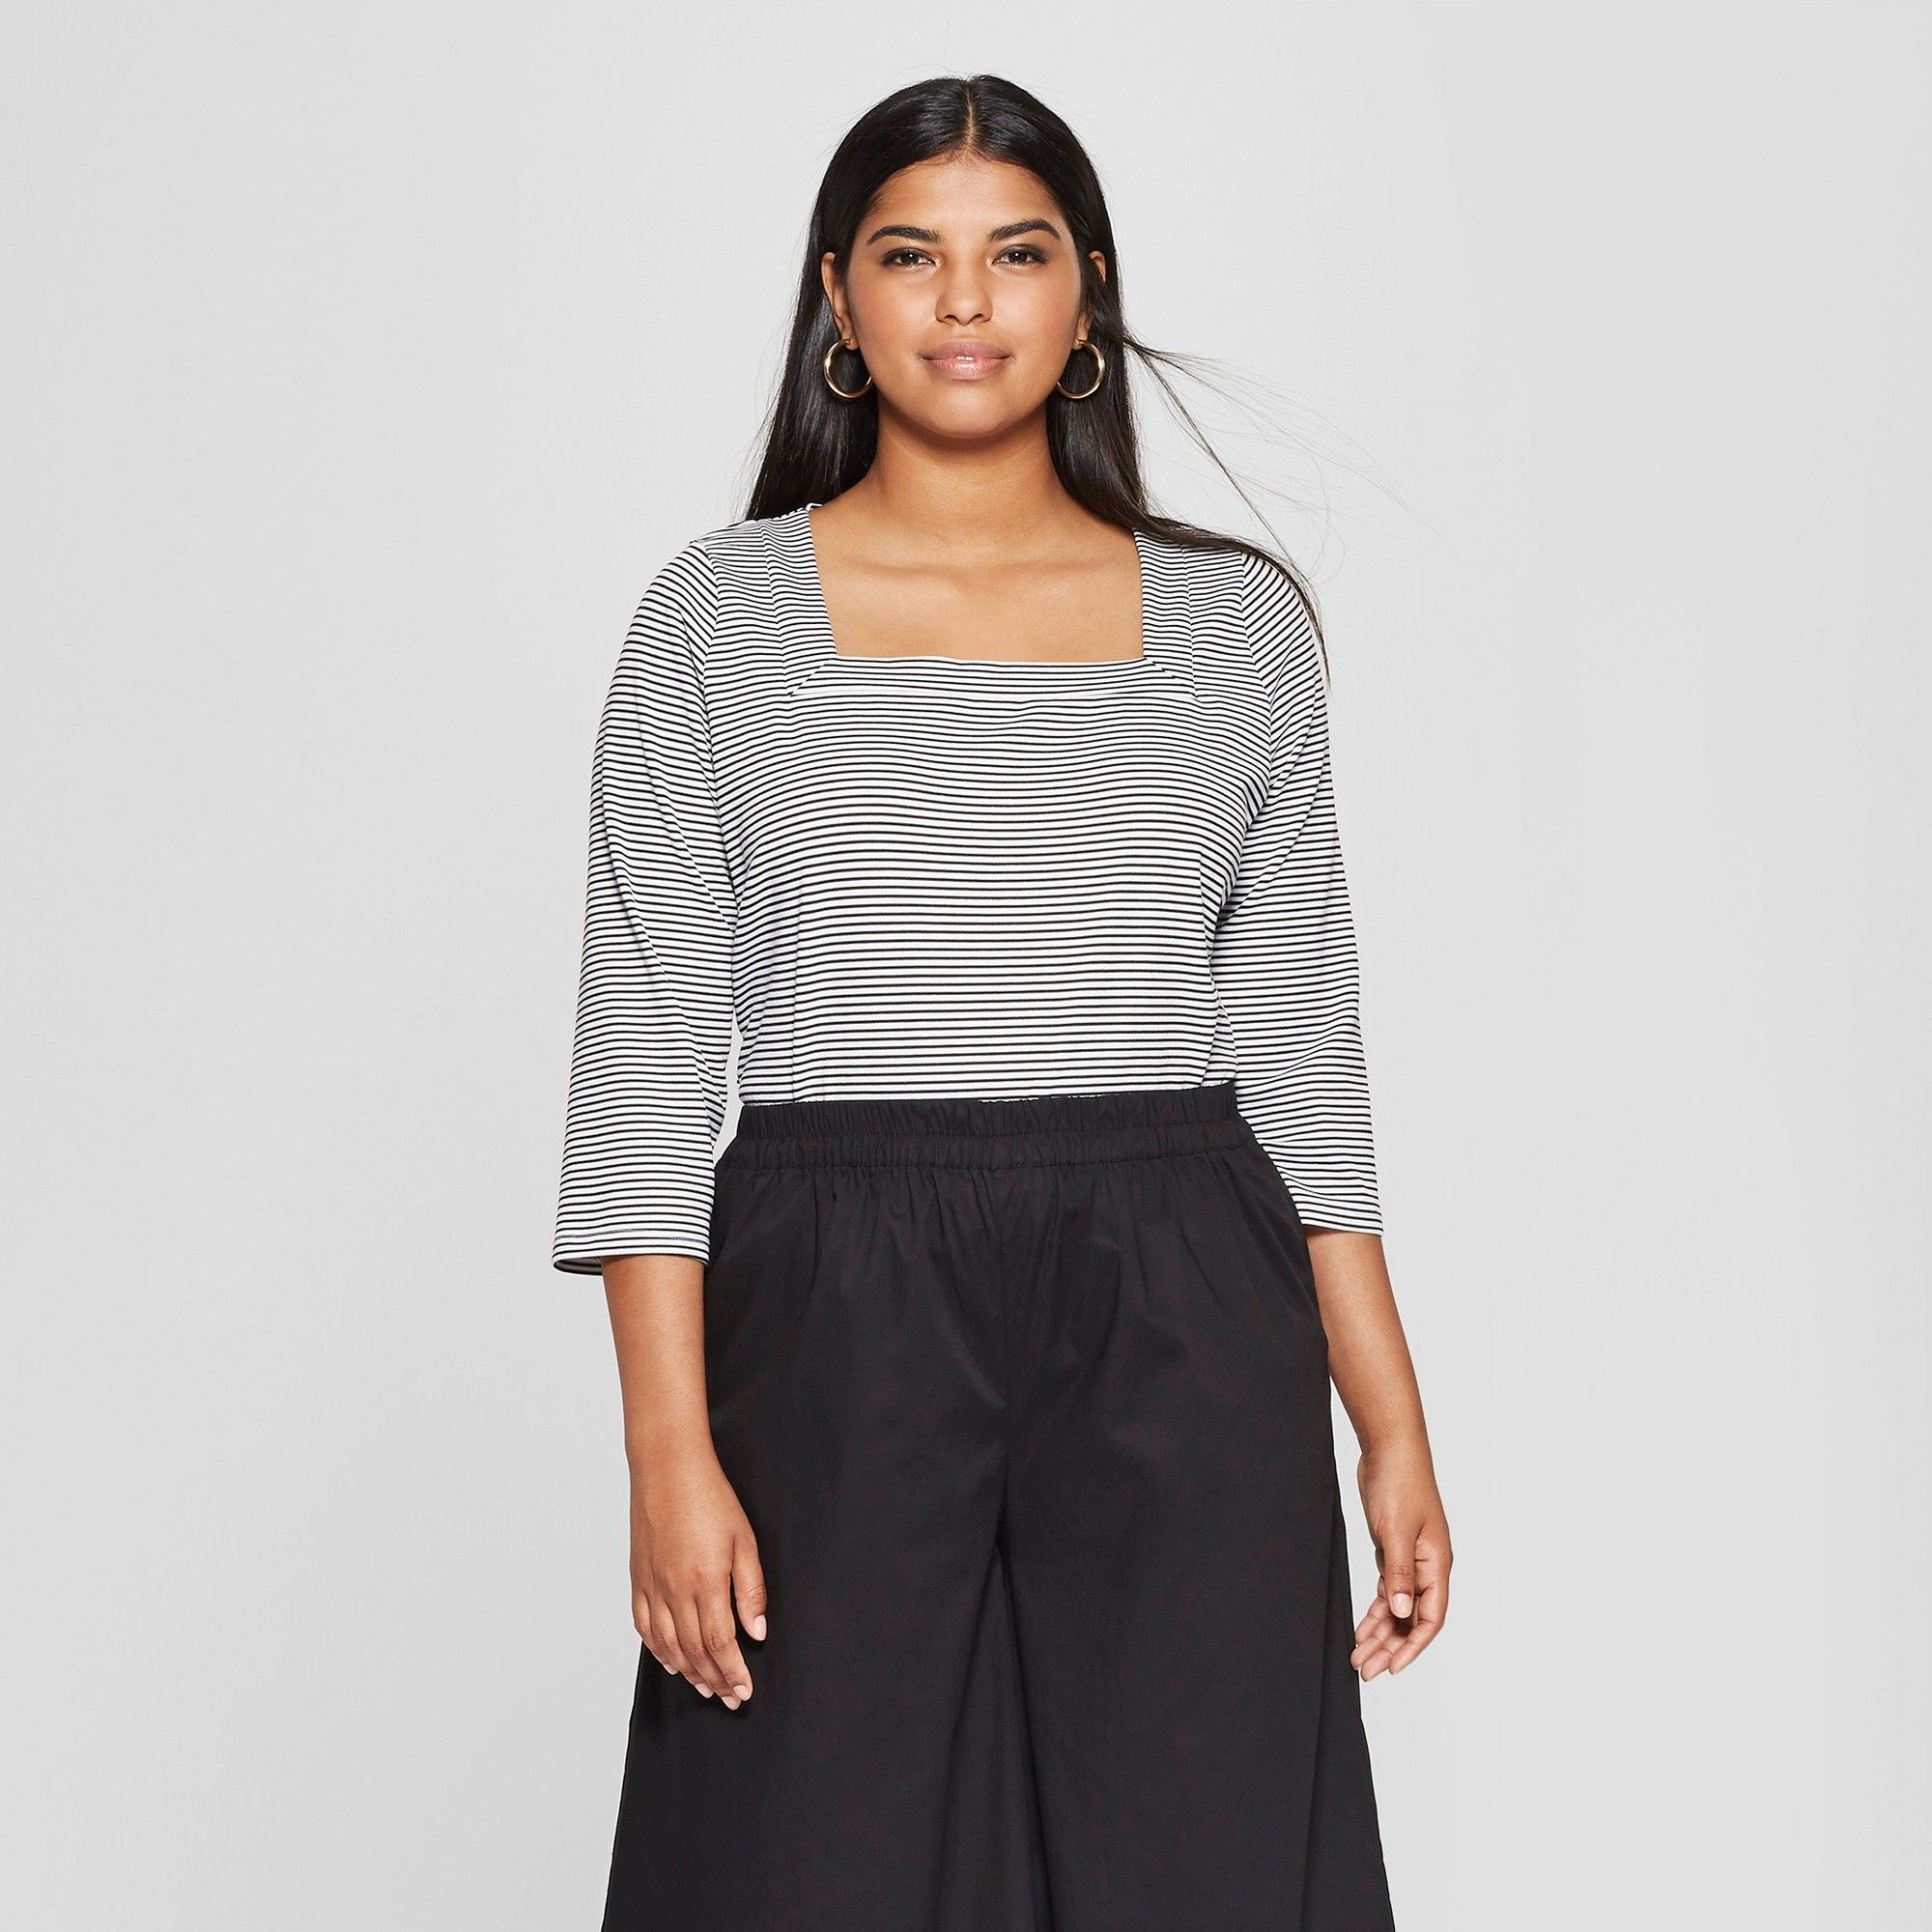 f2dabefe80cae1 Women's Plus Size Striped Long Sleeve Square Neck Top - Who What Wear  Black/White 3X, Black/White Stripe